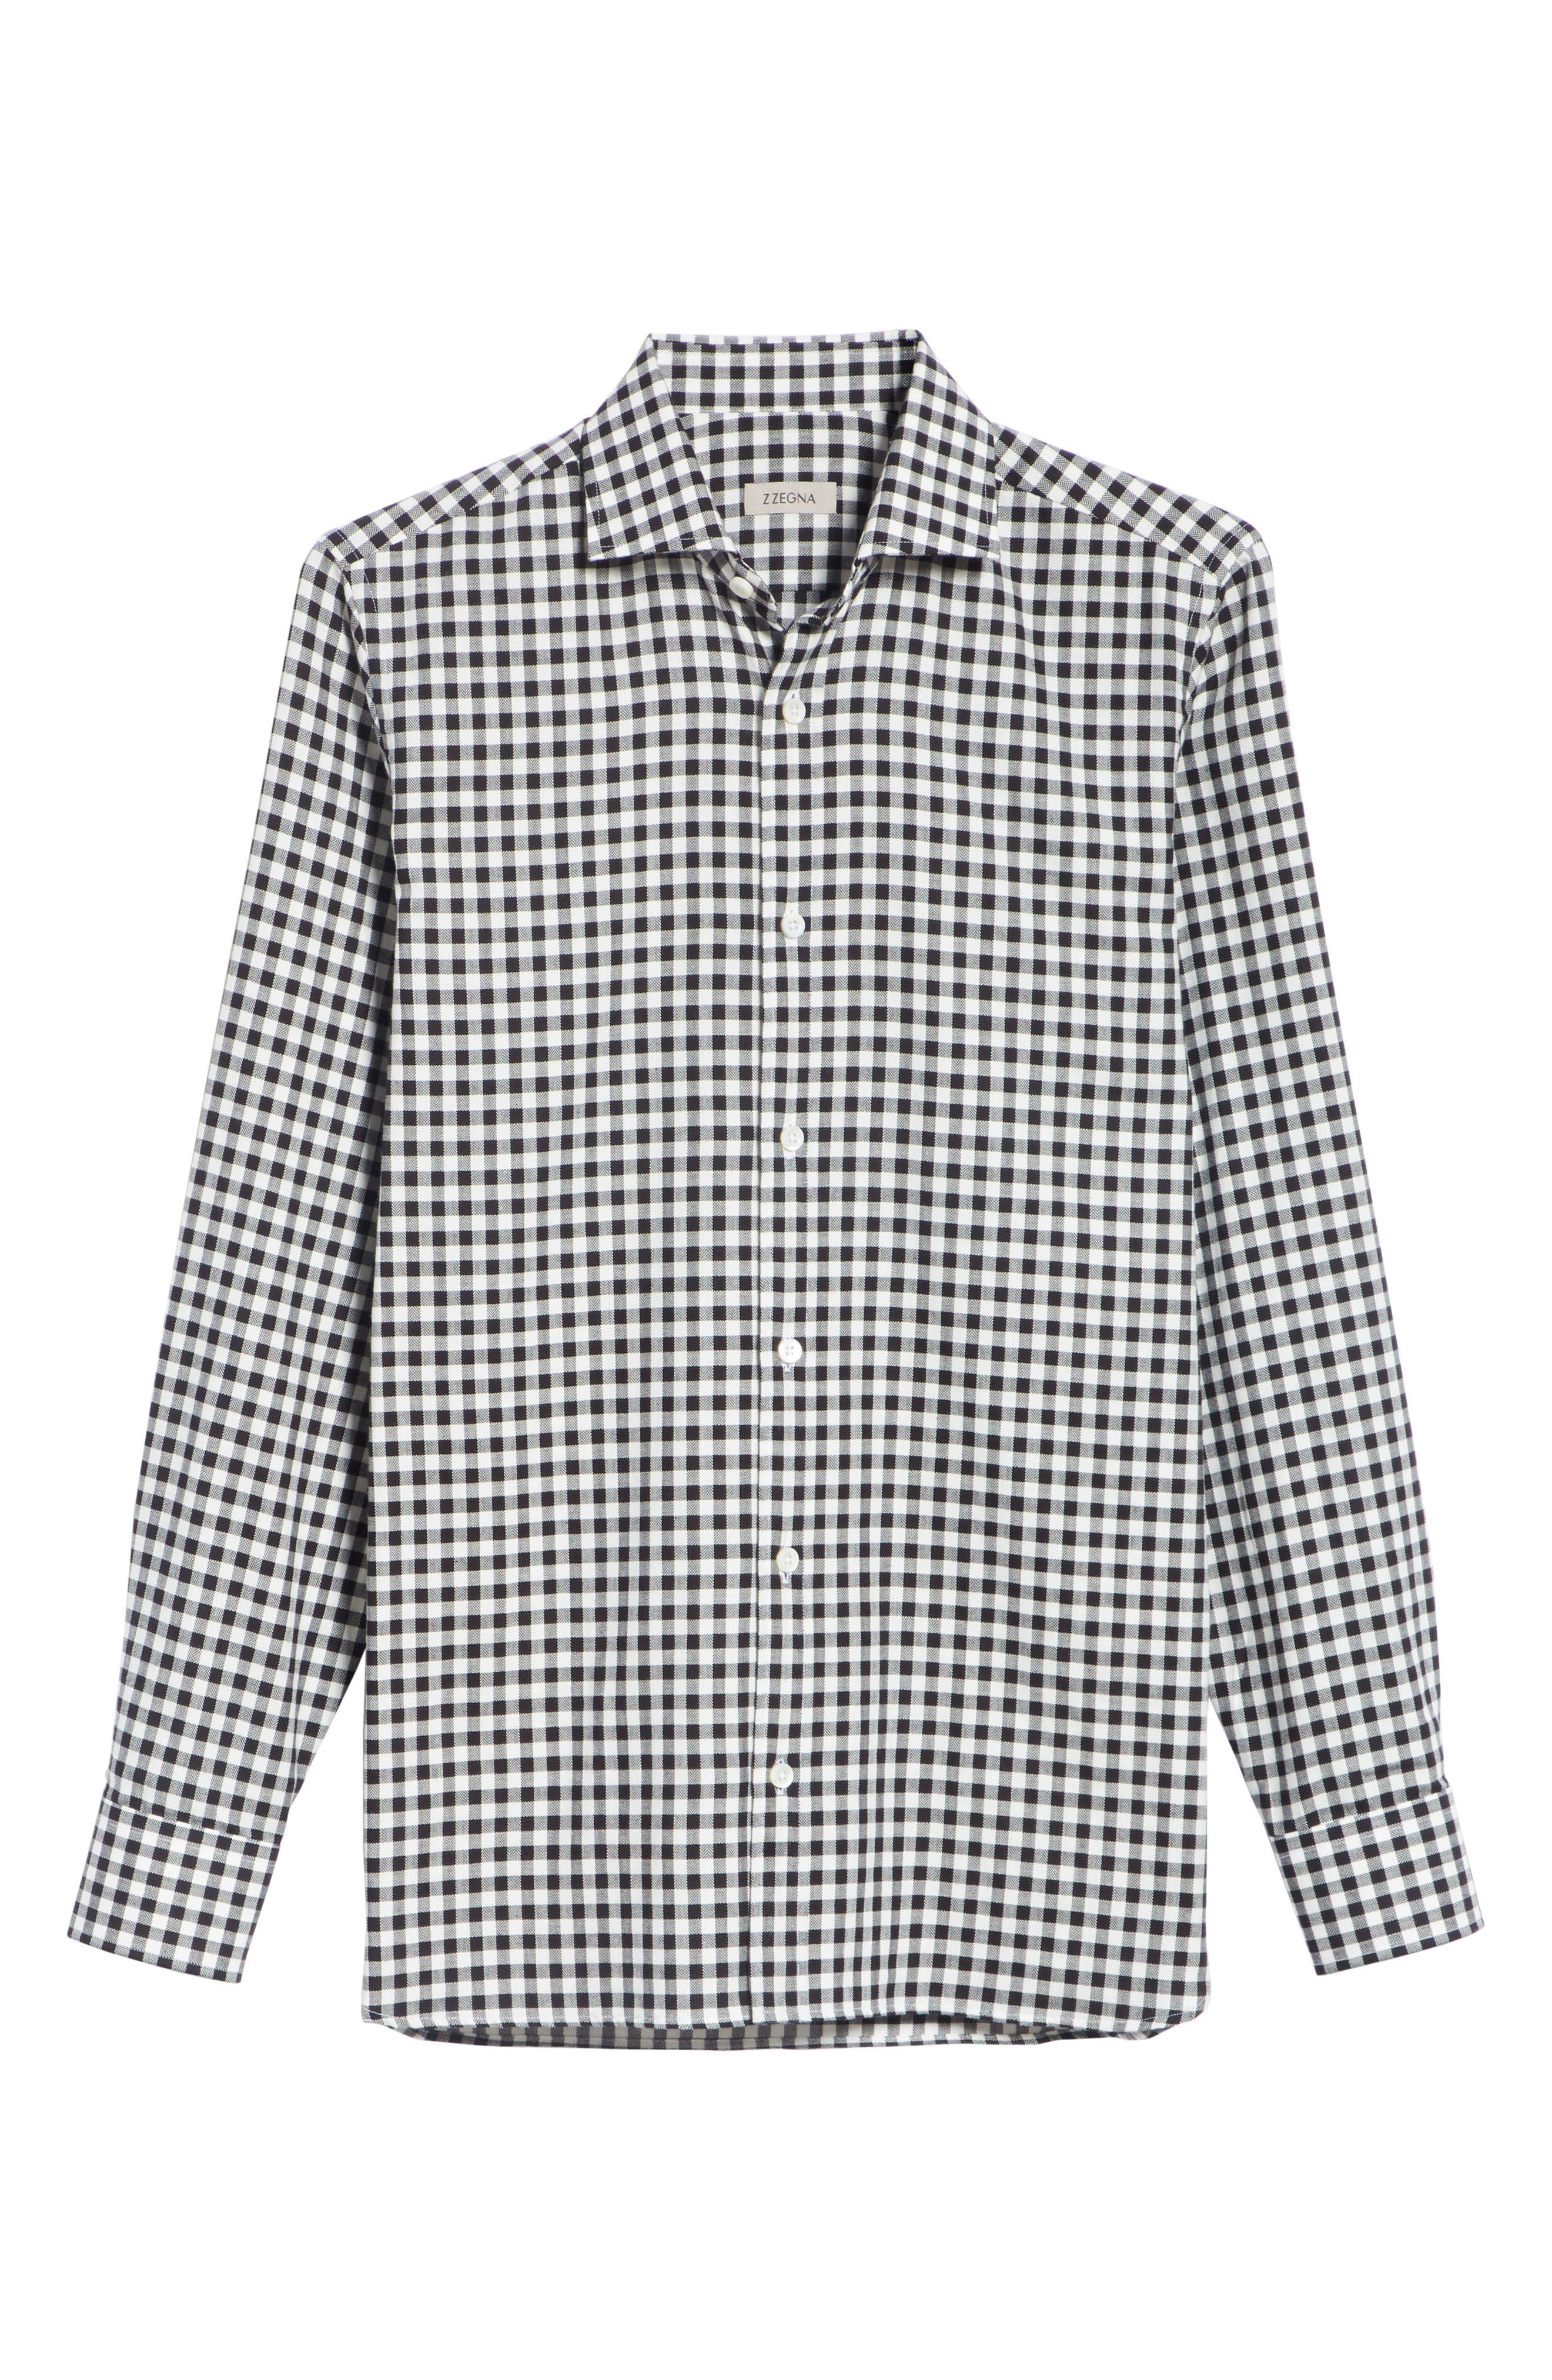 Trim Fit Check Dress Shirt,                             Alternate thumbnail 6, color,                             BLACK